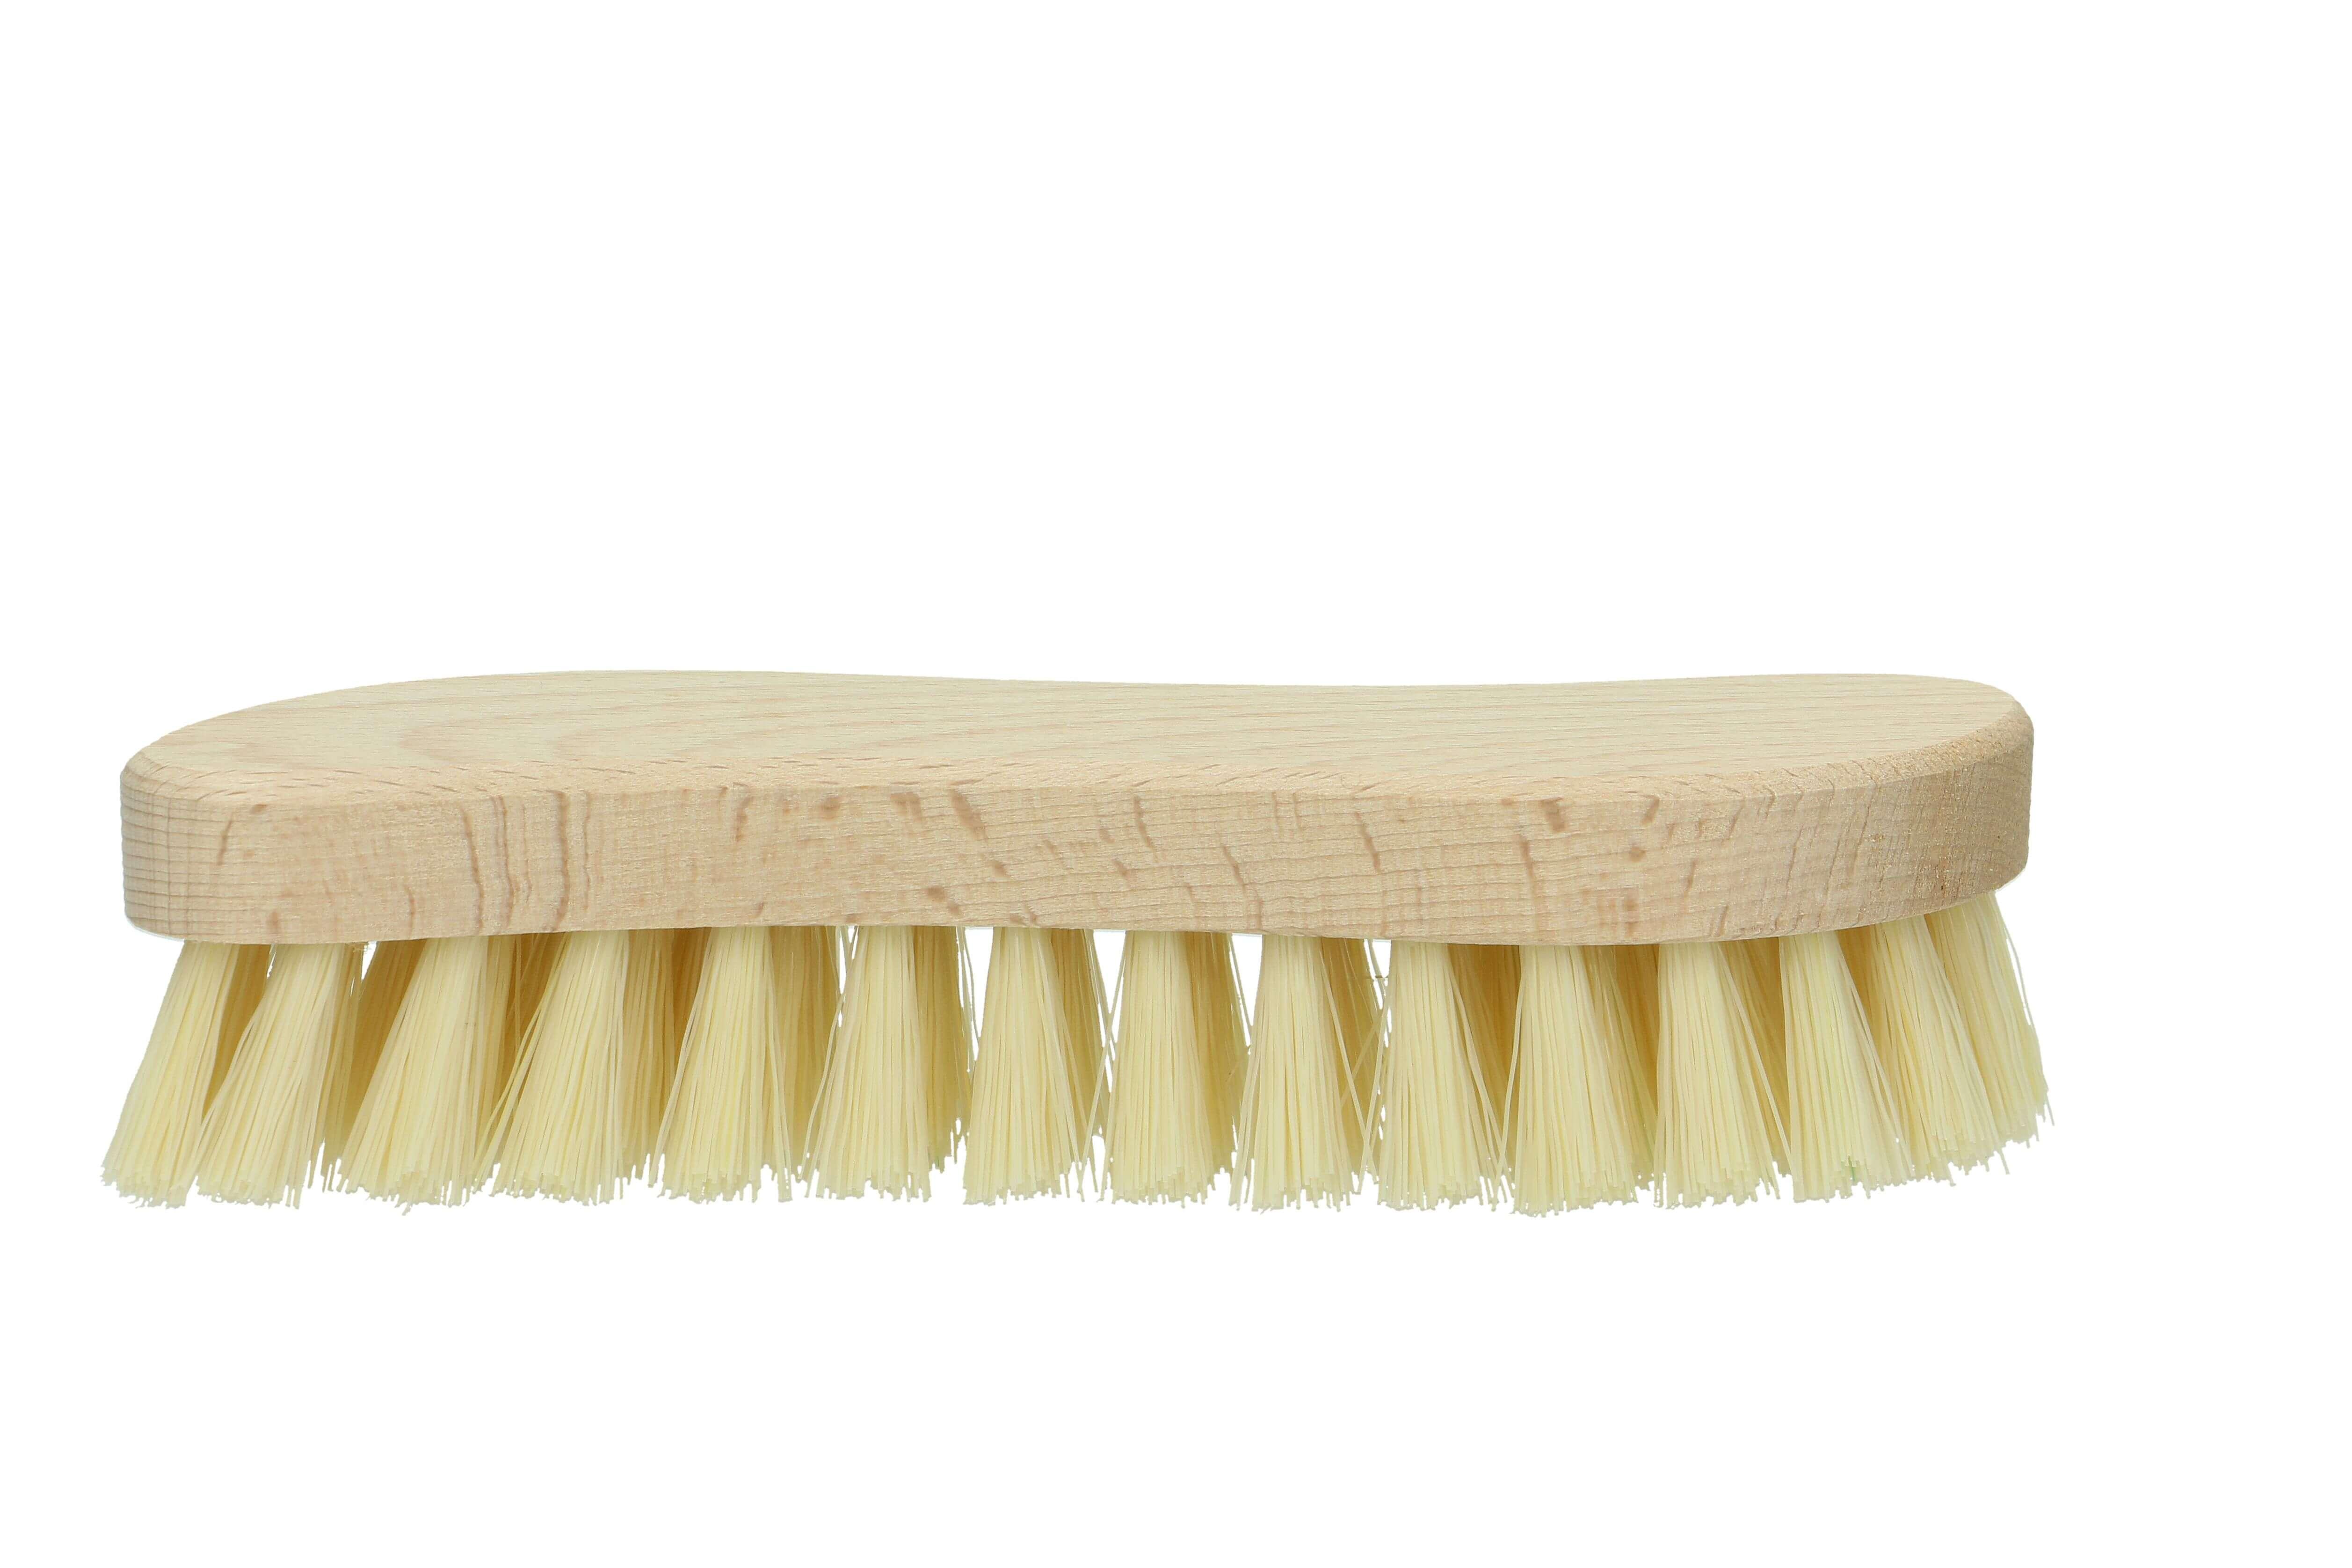 S-borstel hout tampico